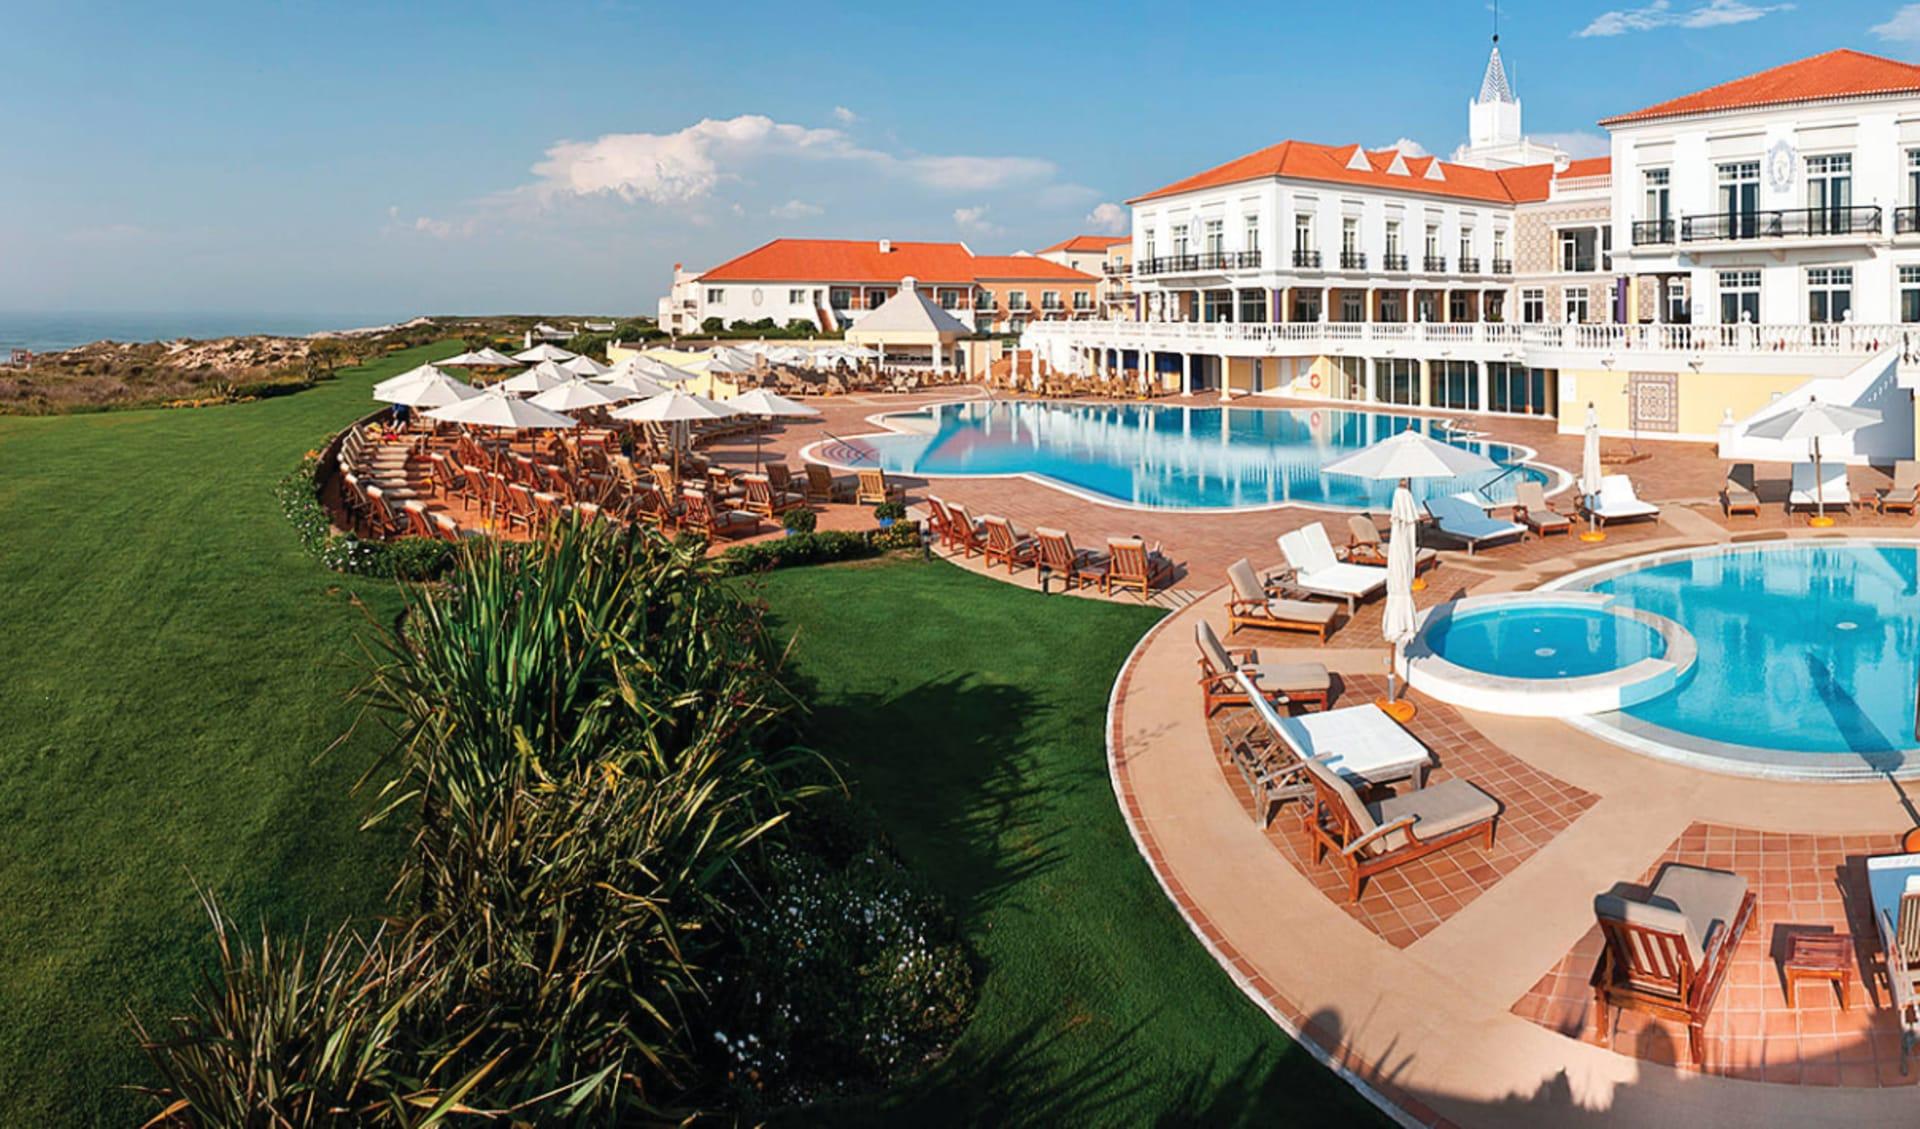 Praia d'el Rey Marriott Golf & Beach Resort in Cascais: Hotel - Exterior (6)